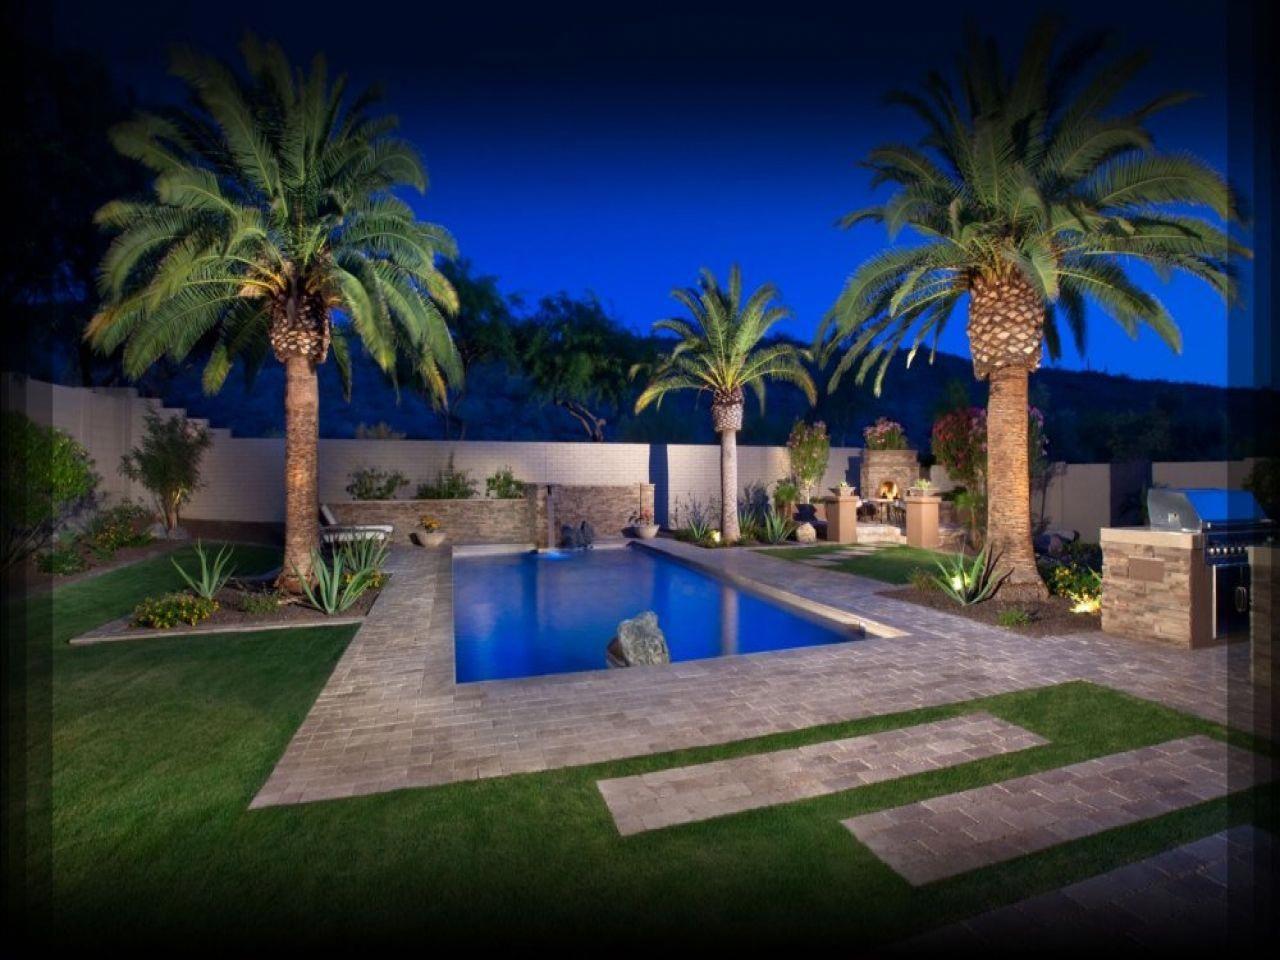 Waterfalls In Backyard Phoenix Desert Landscaping Pool Ideas Backyard Pool Landscaping Pool Landscape Design Arizona Backyard Landscaping